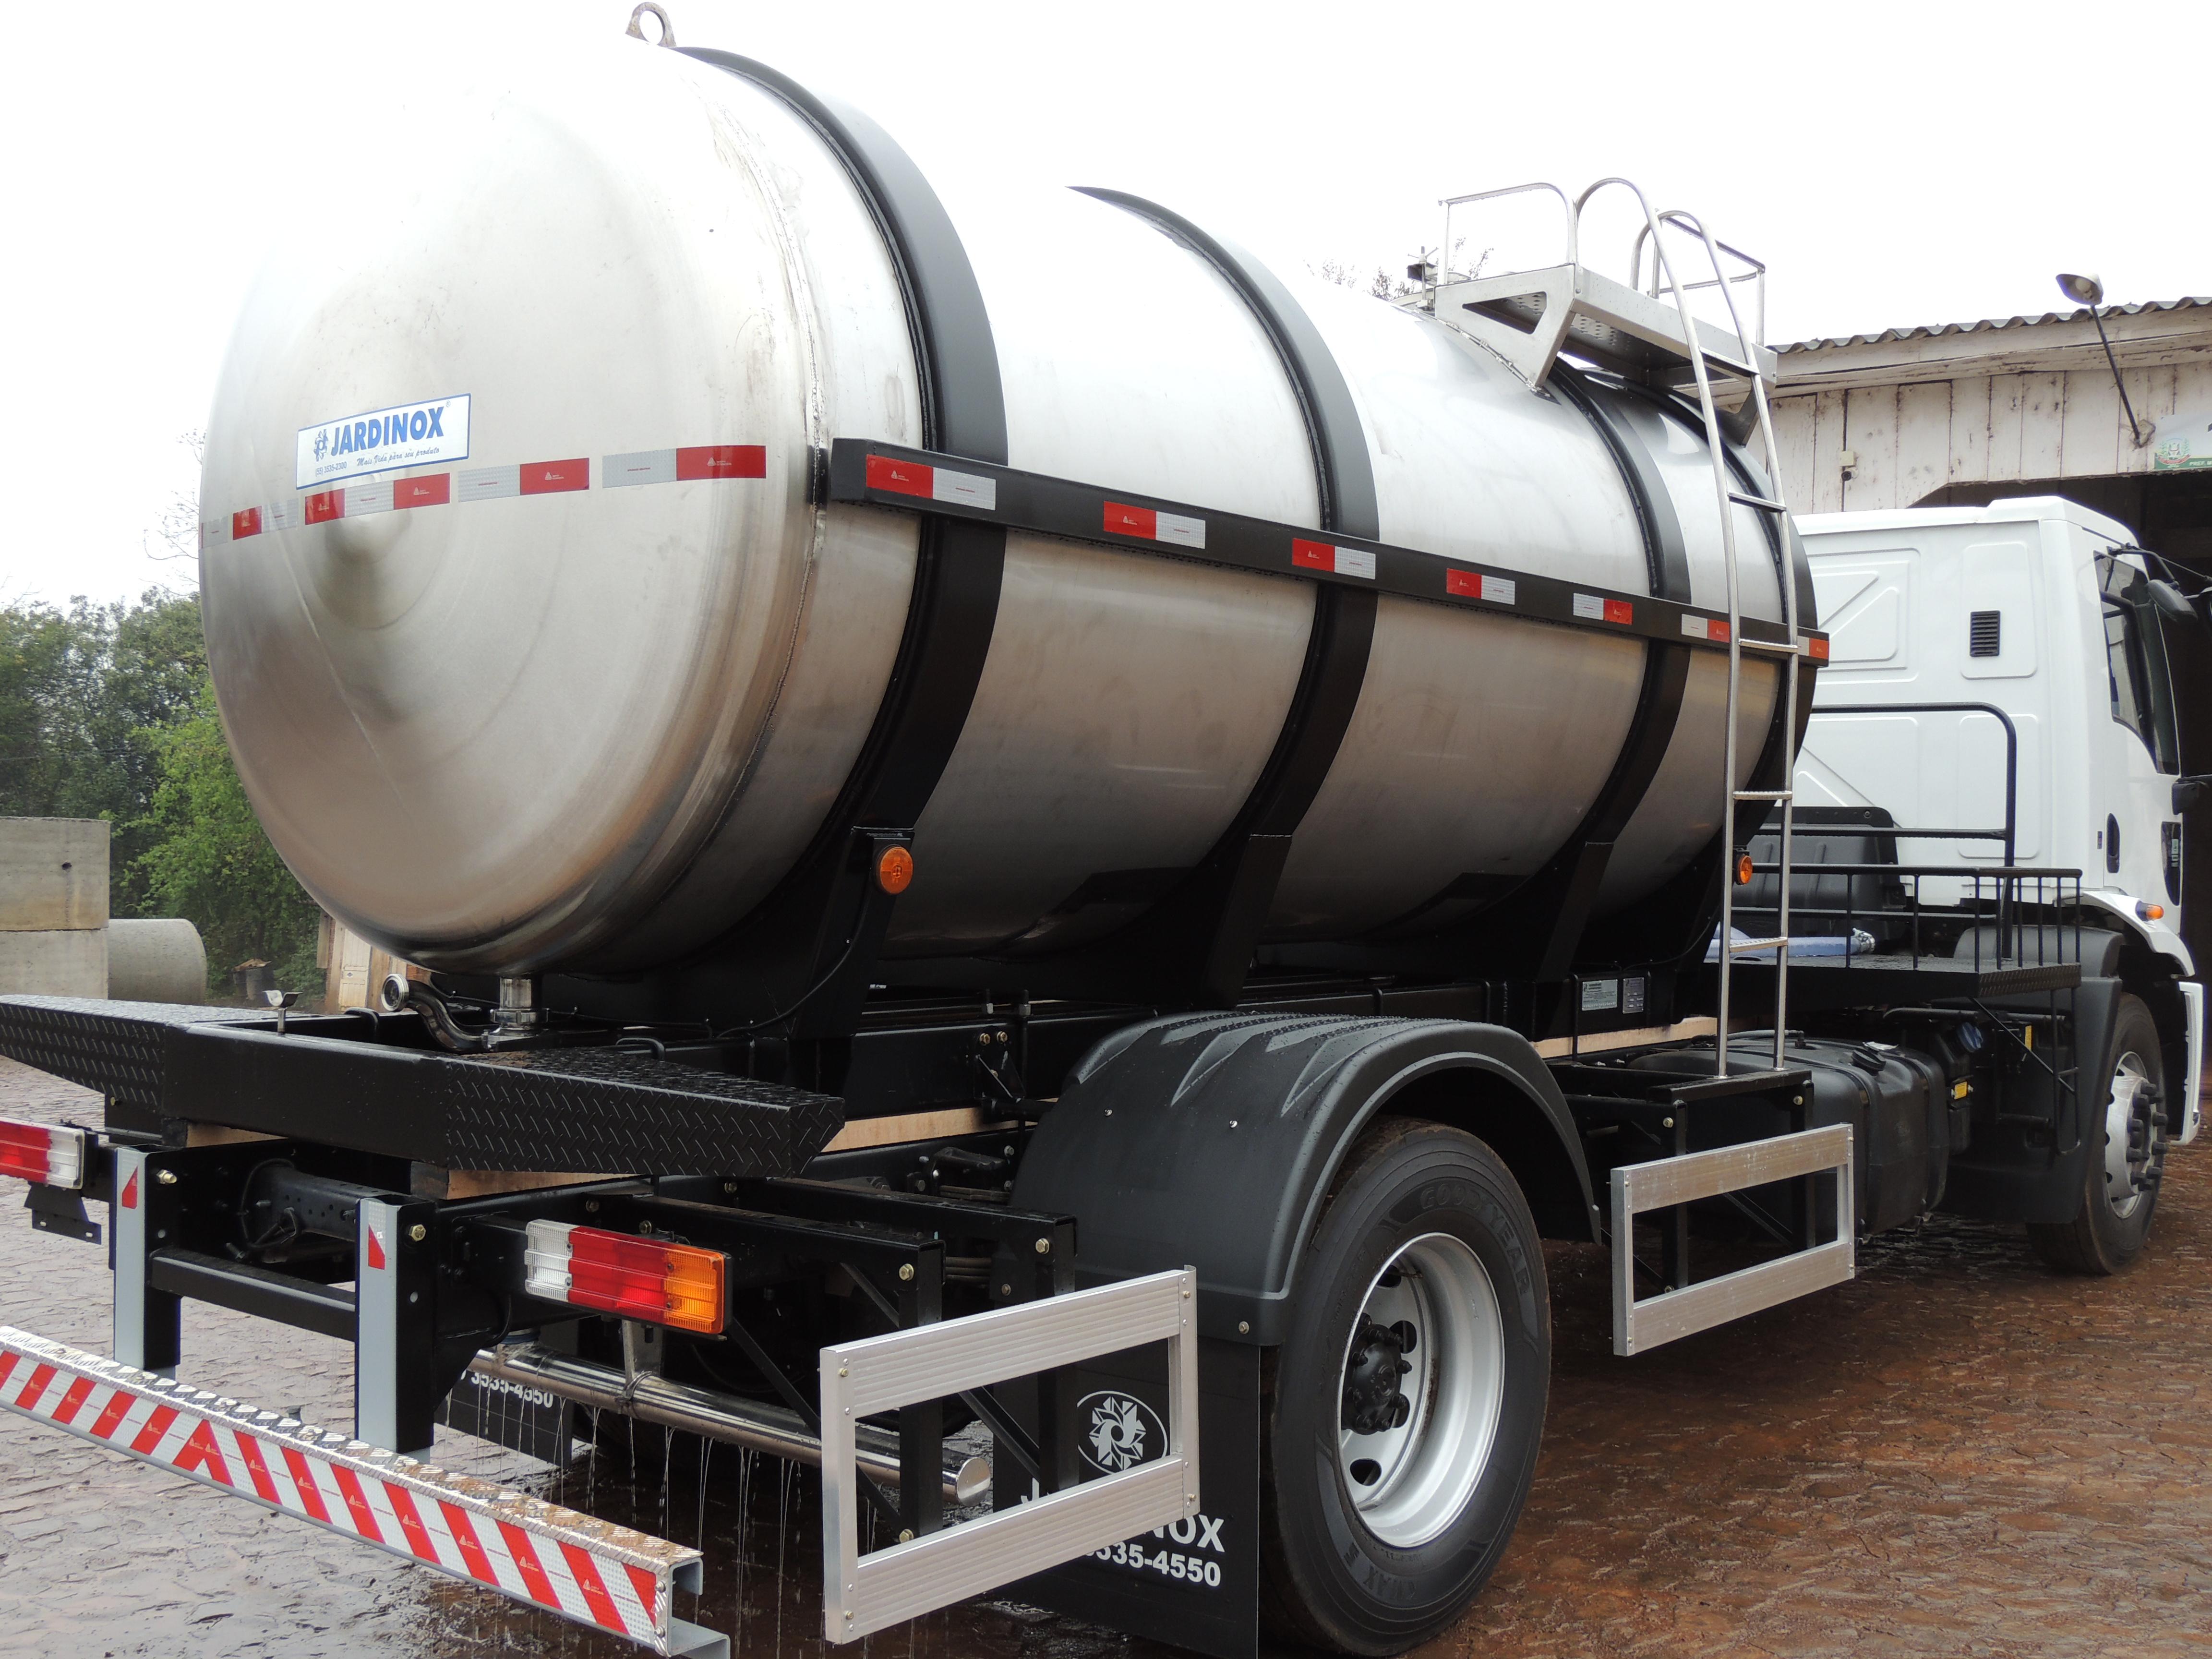 Município de Descanso adquire tanque para transportar água